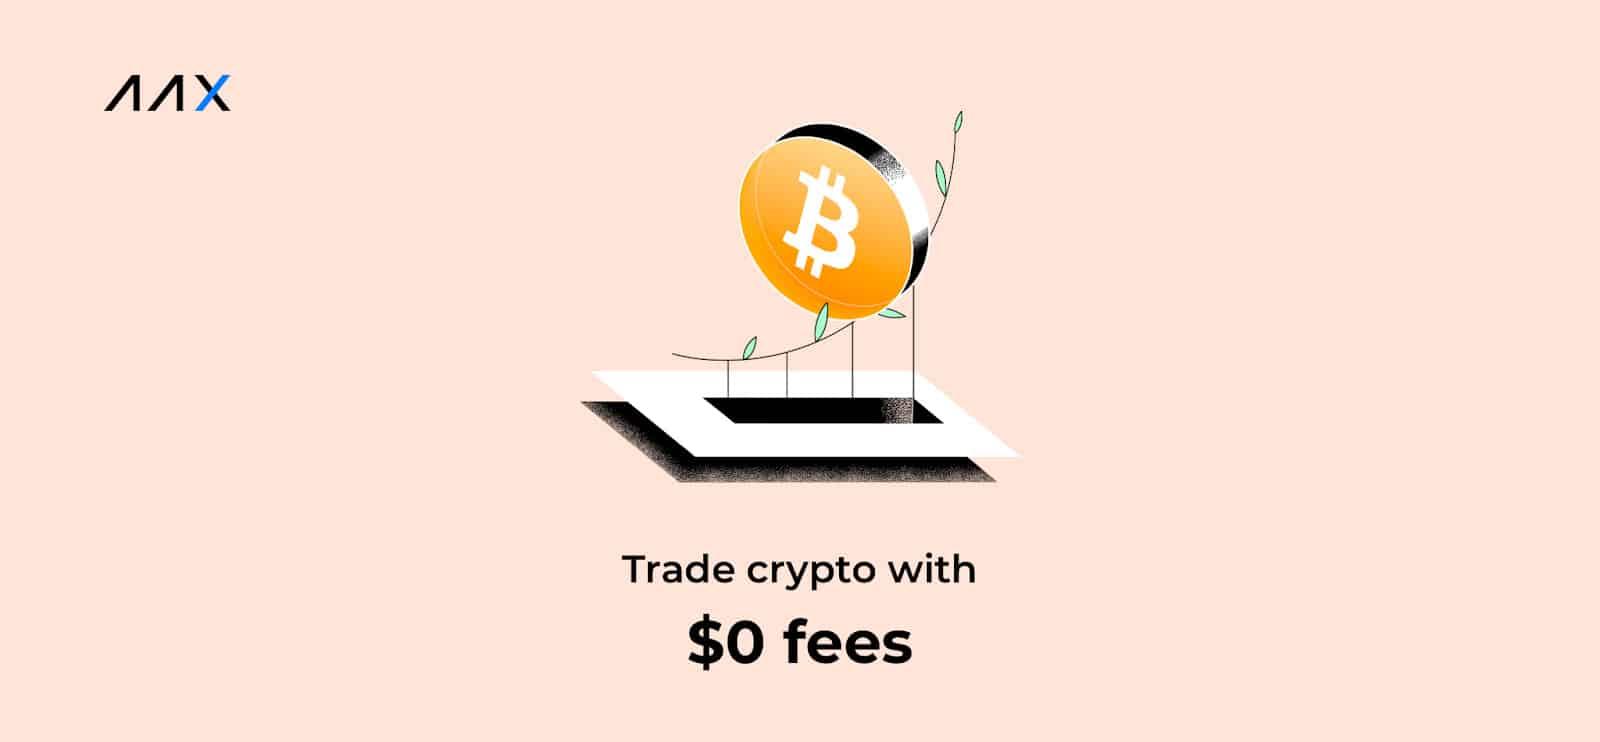 AAX EXhange Launches Zero-Fee Crypto Trading Services